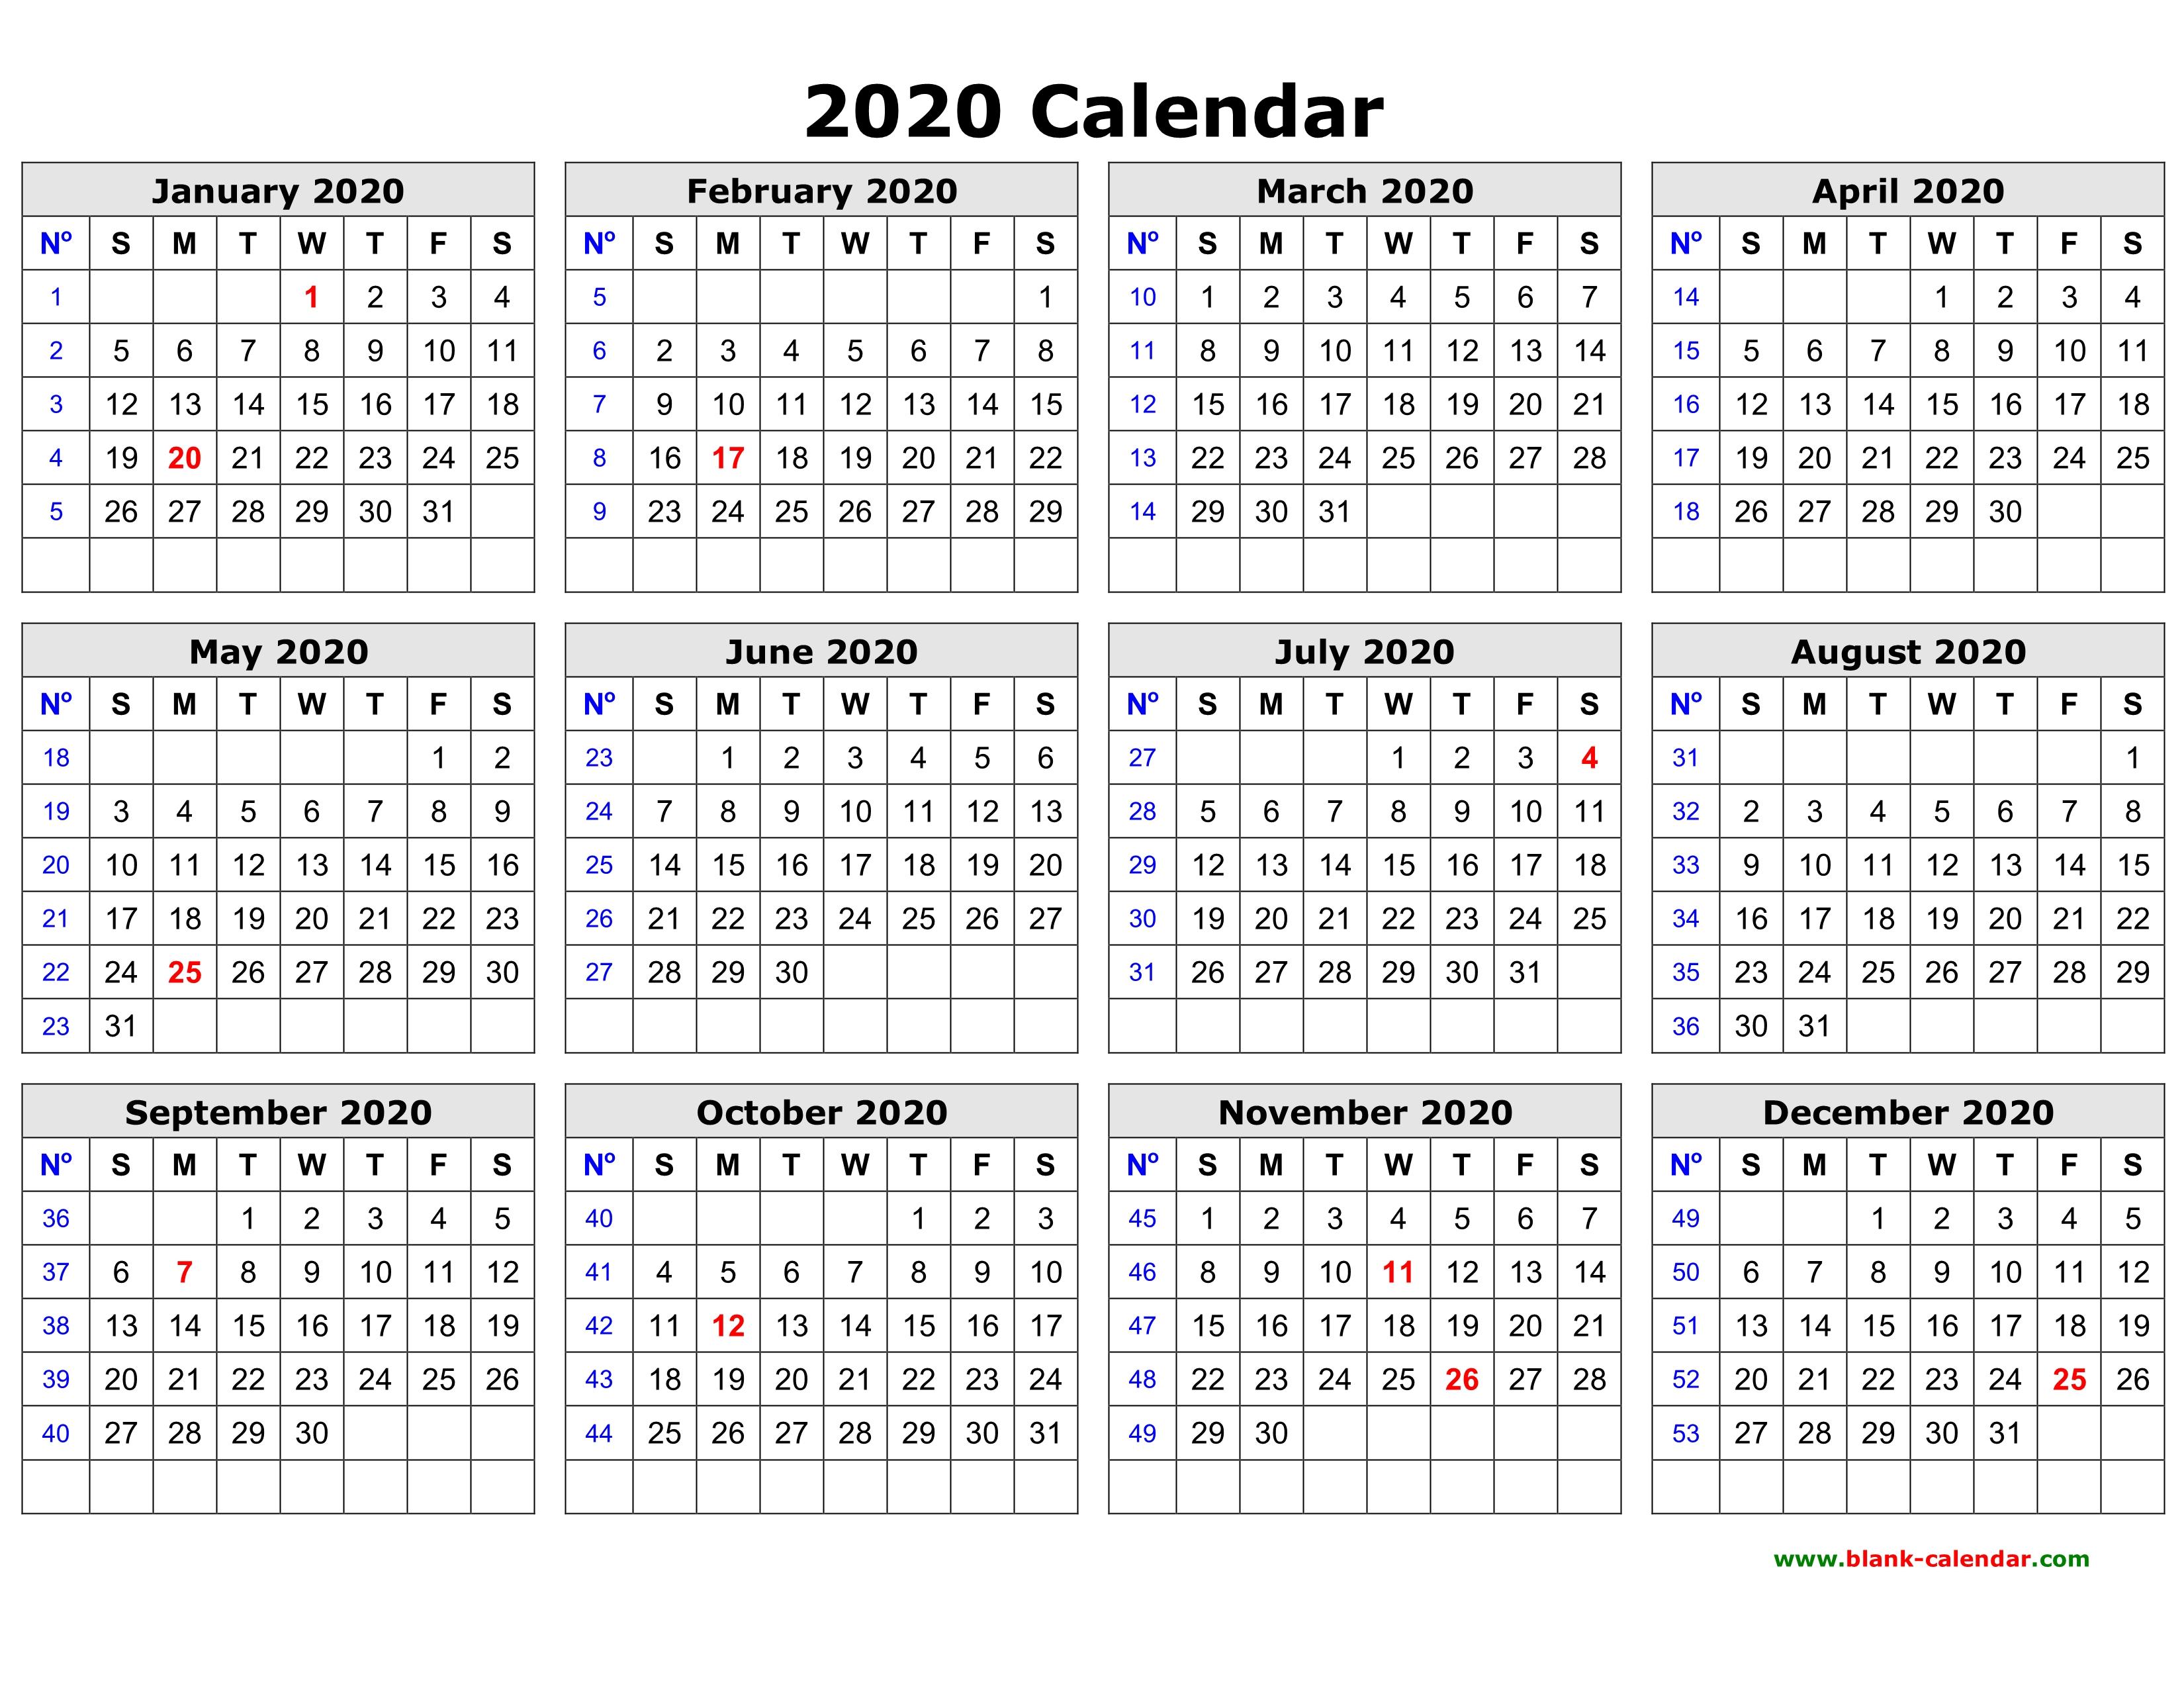 Free Downloadable 2020 Calendar - Wpa.wpart.co